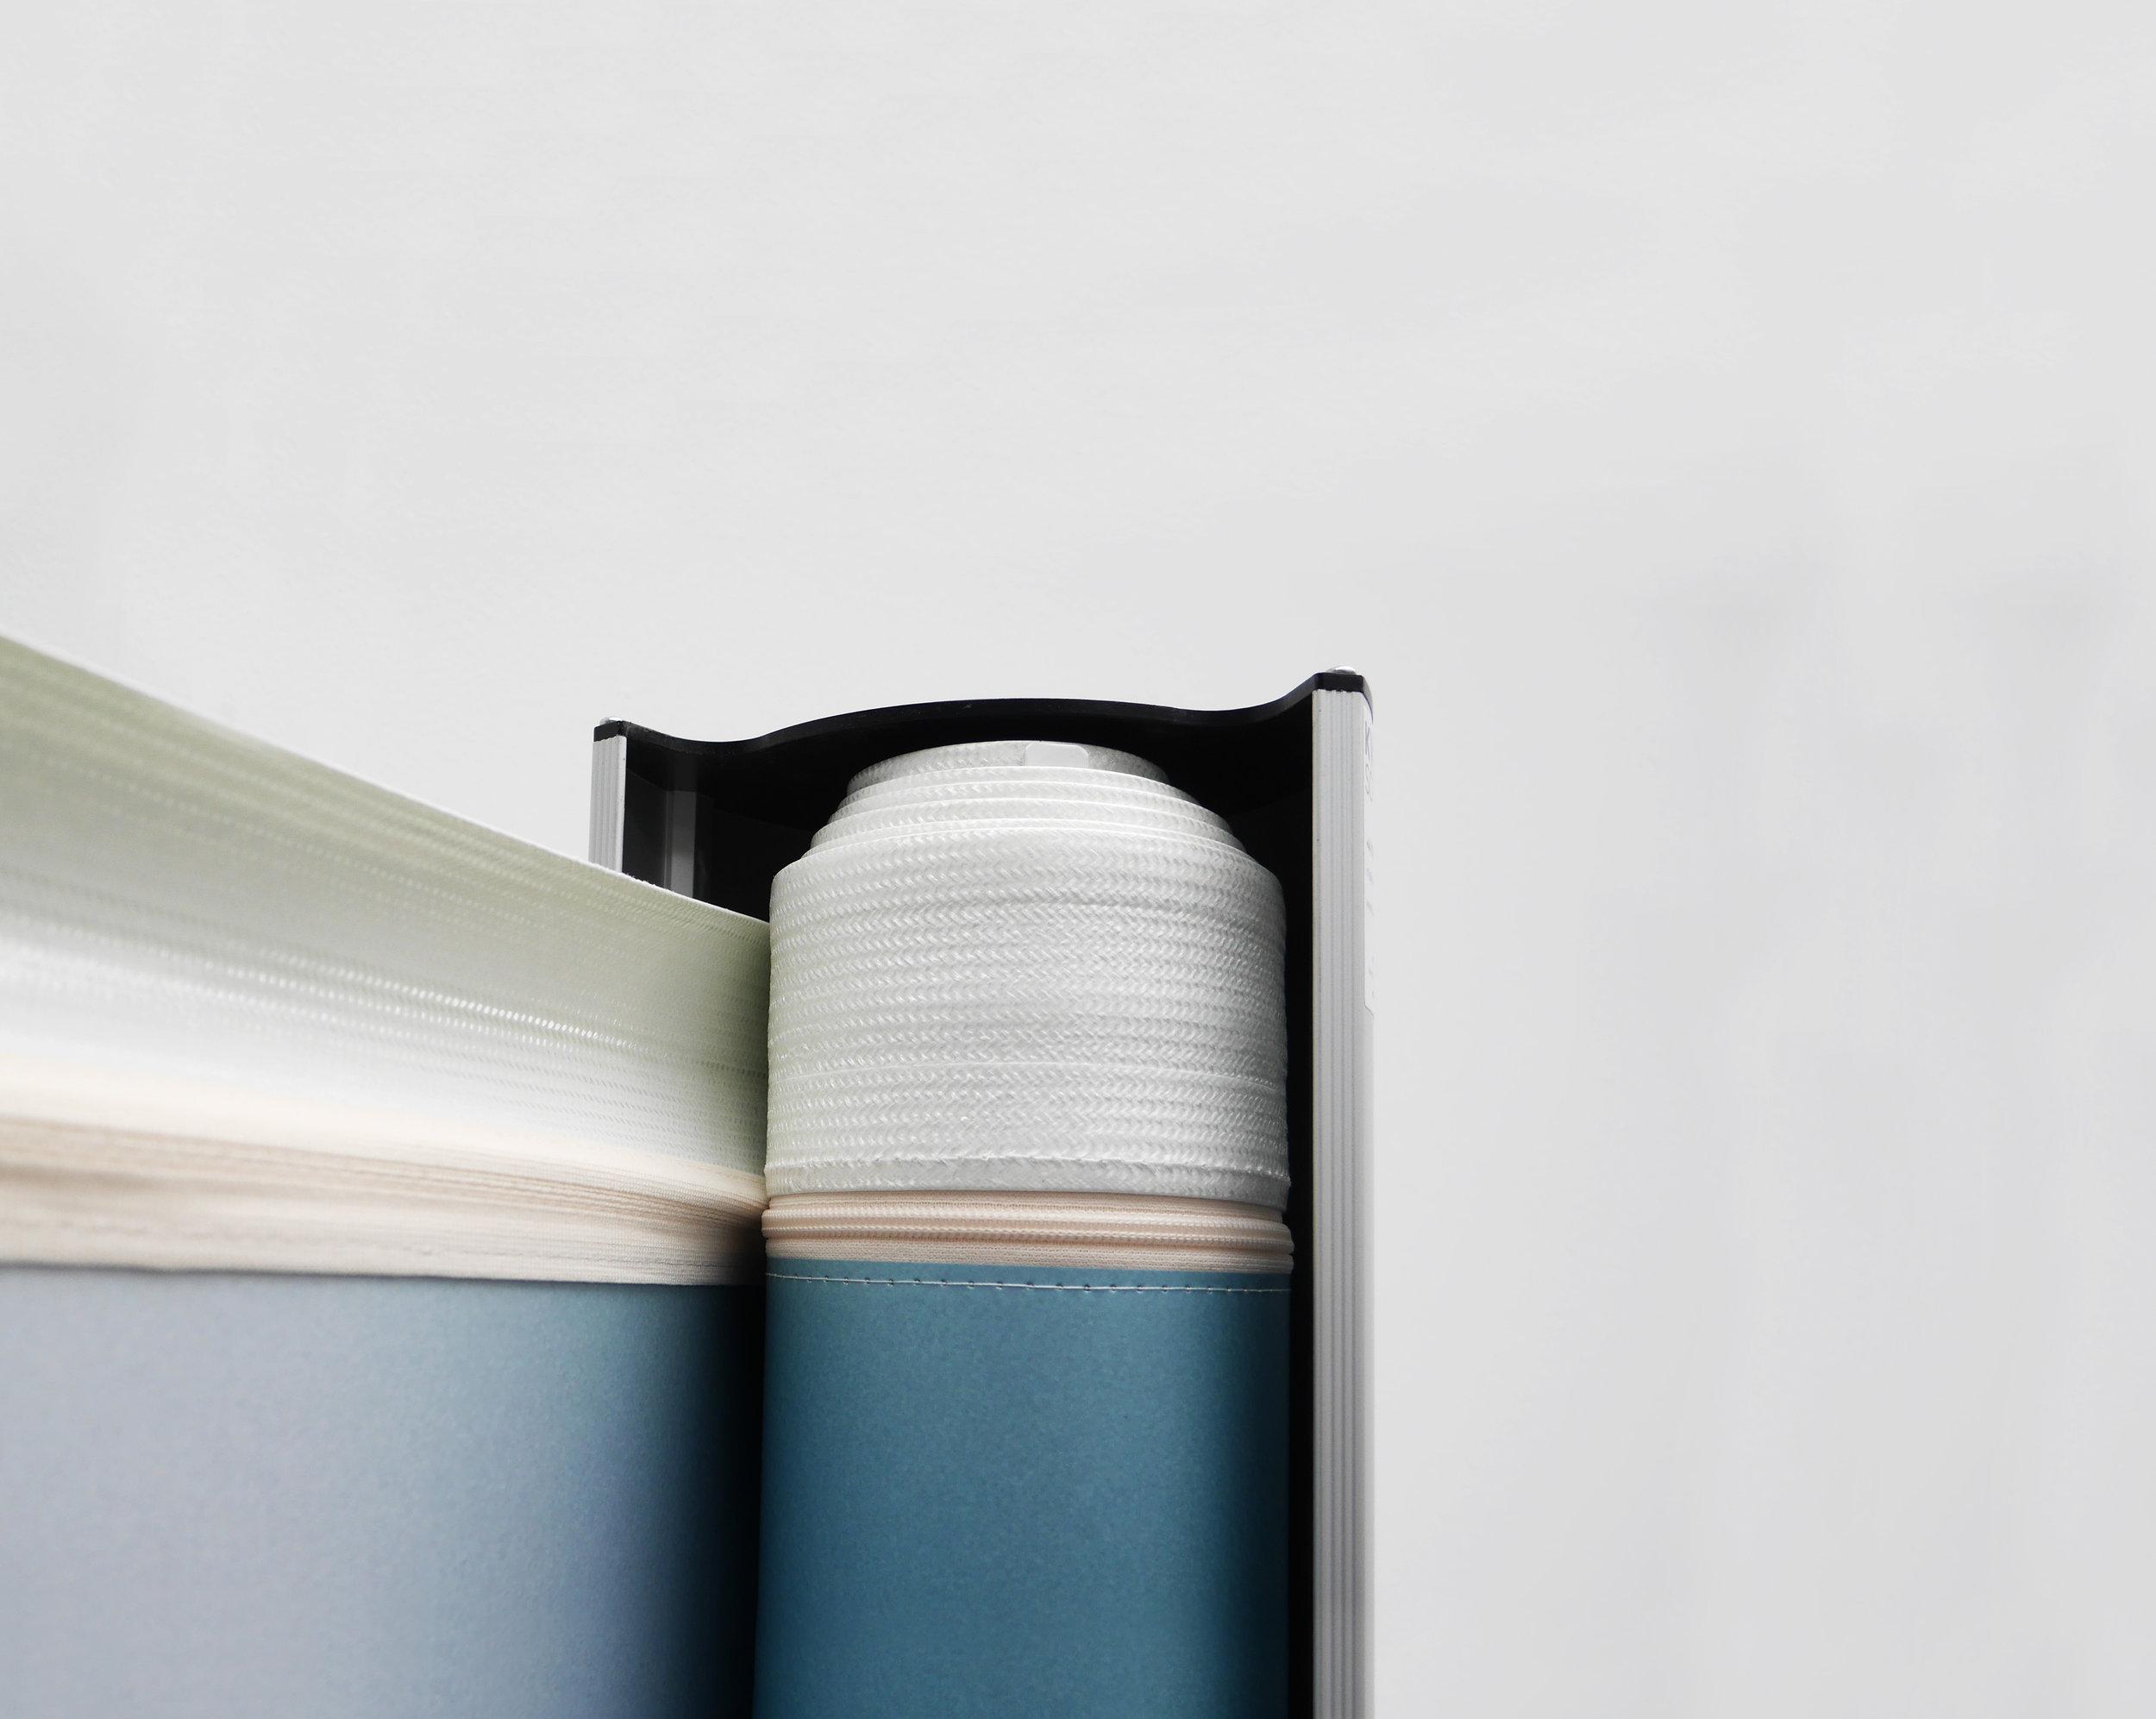 KwickScreen Customisable Inner Pannel